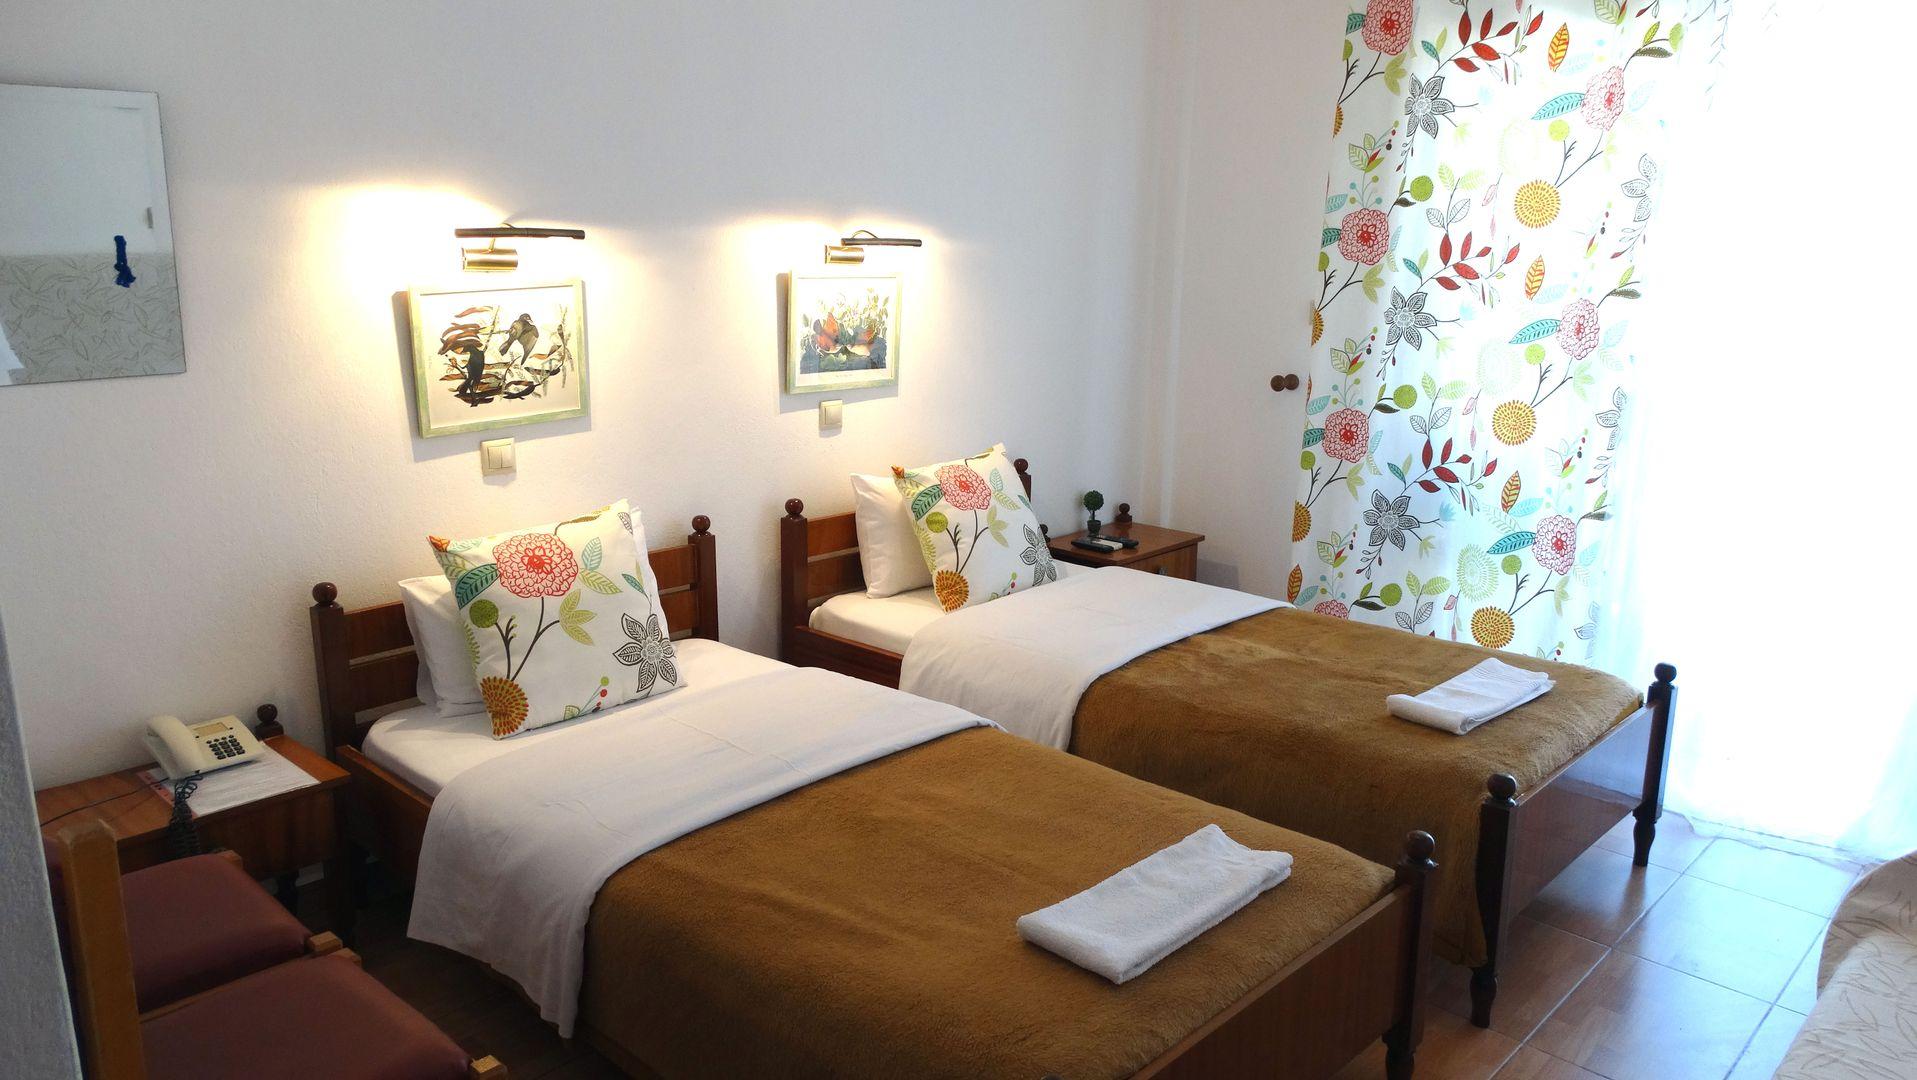 Guest house_ pansion_ athos_ ouranoupoli chalkidiki_mount athos-0062